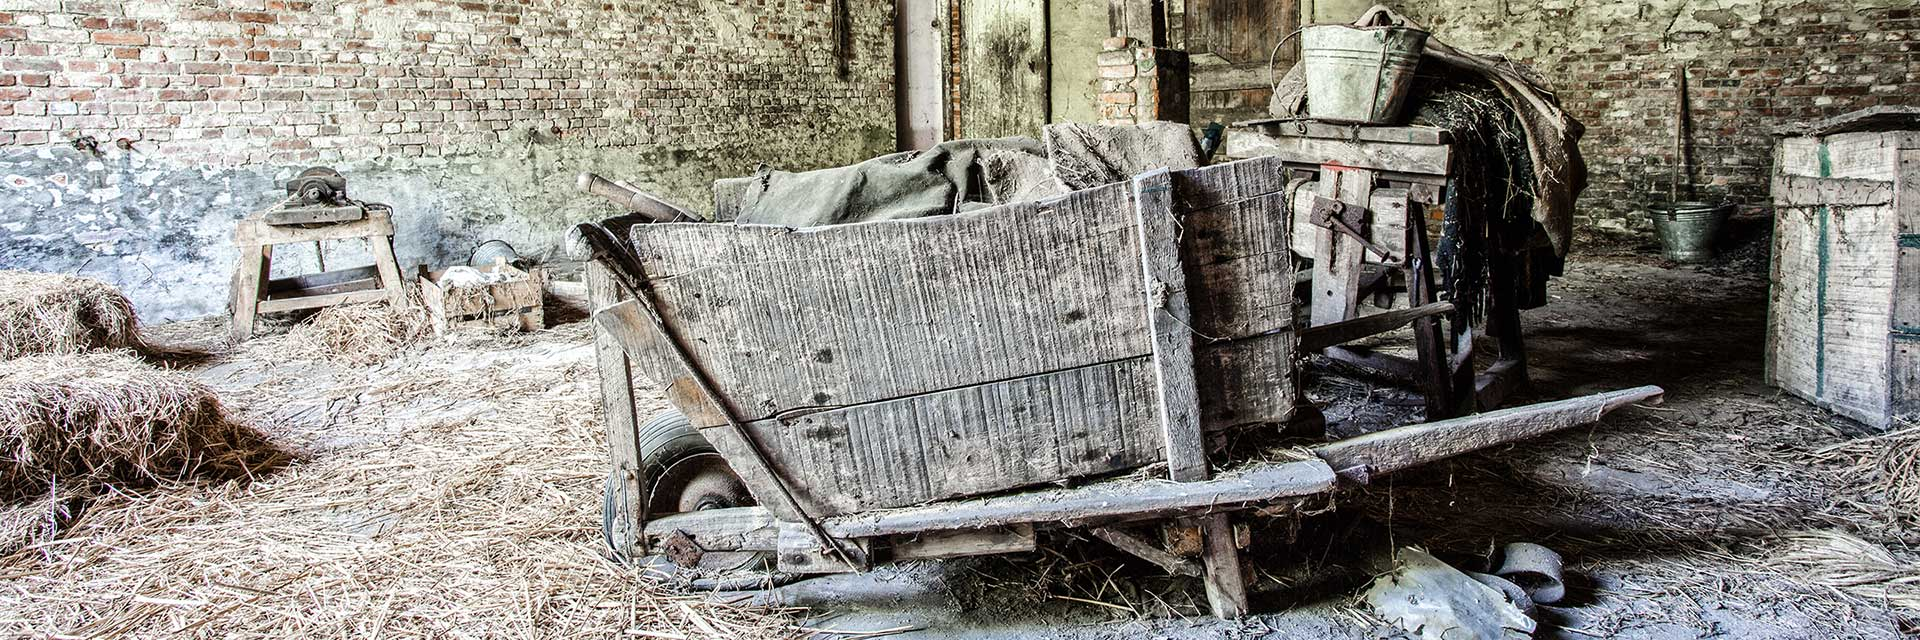 farm-paternoster-urbex-vervallen-abandoned-belgie-kruiwagen